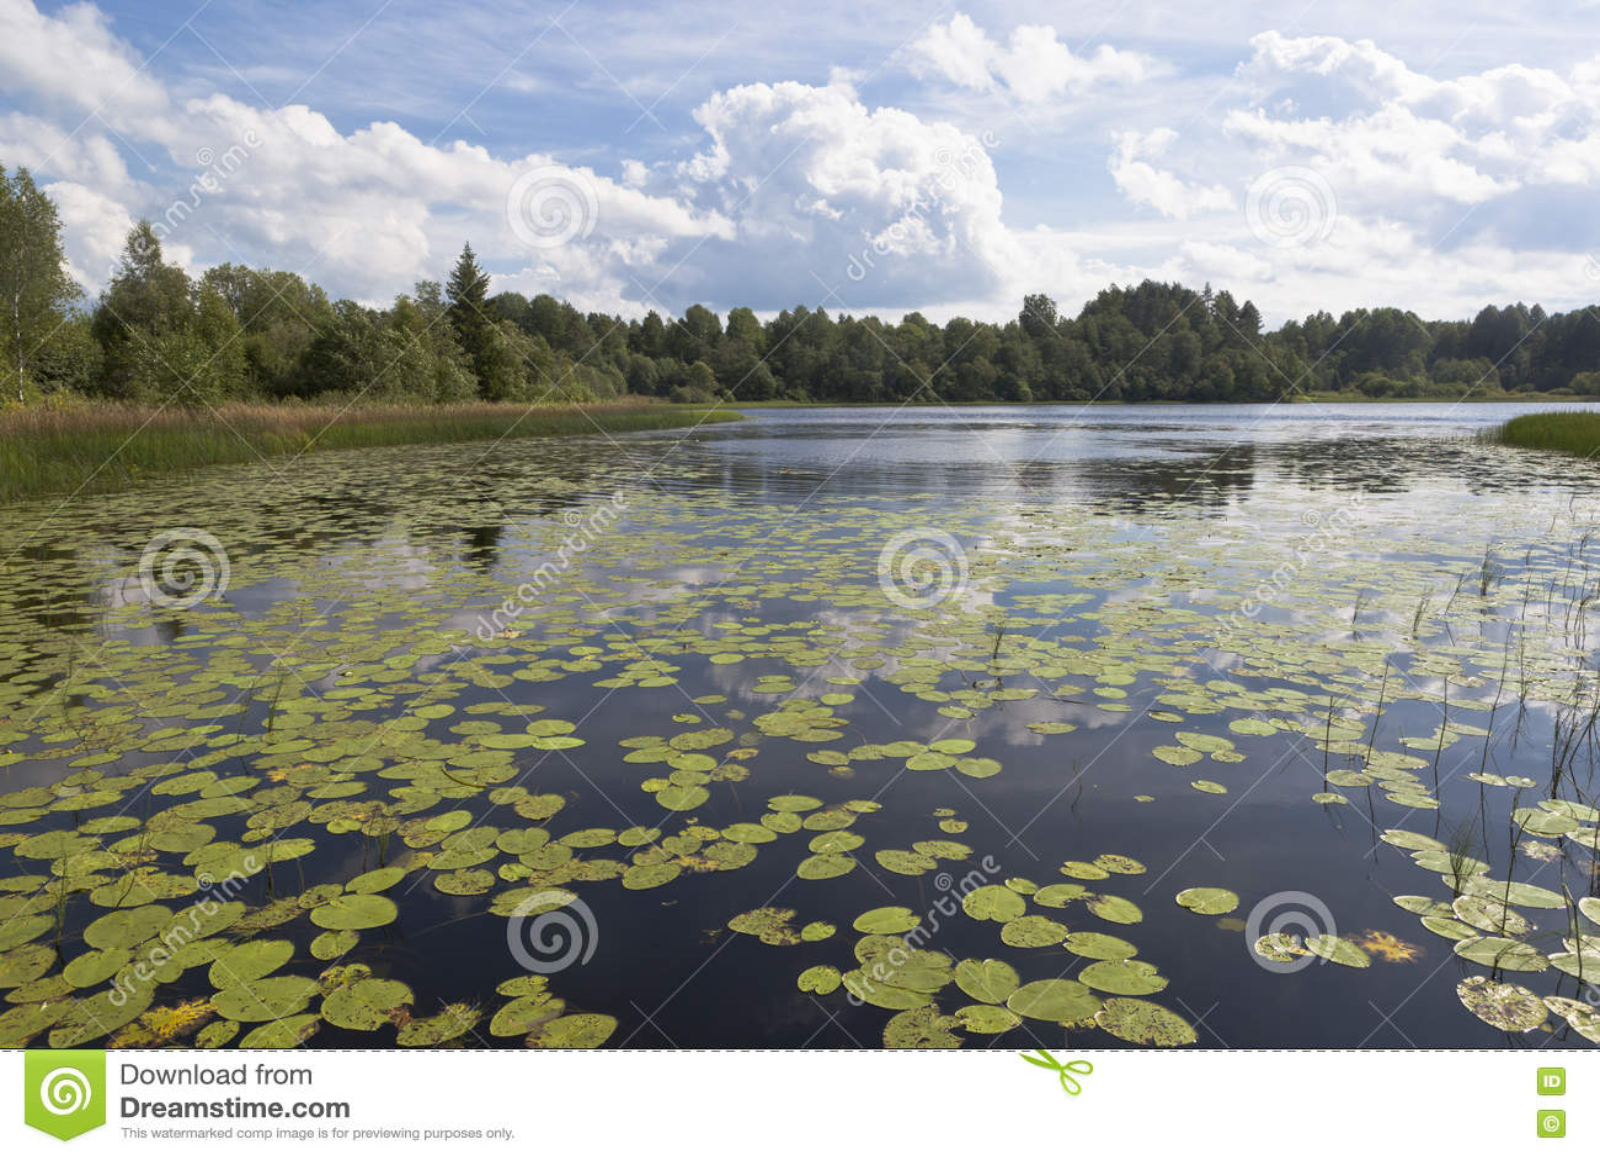 Ilinskoe lake in the national park Russian North in the Kirillov district, Vologda region, Russia